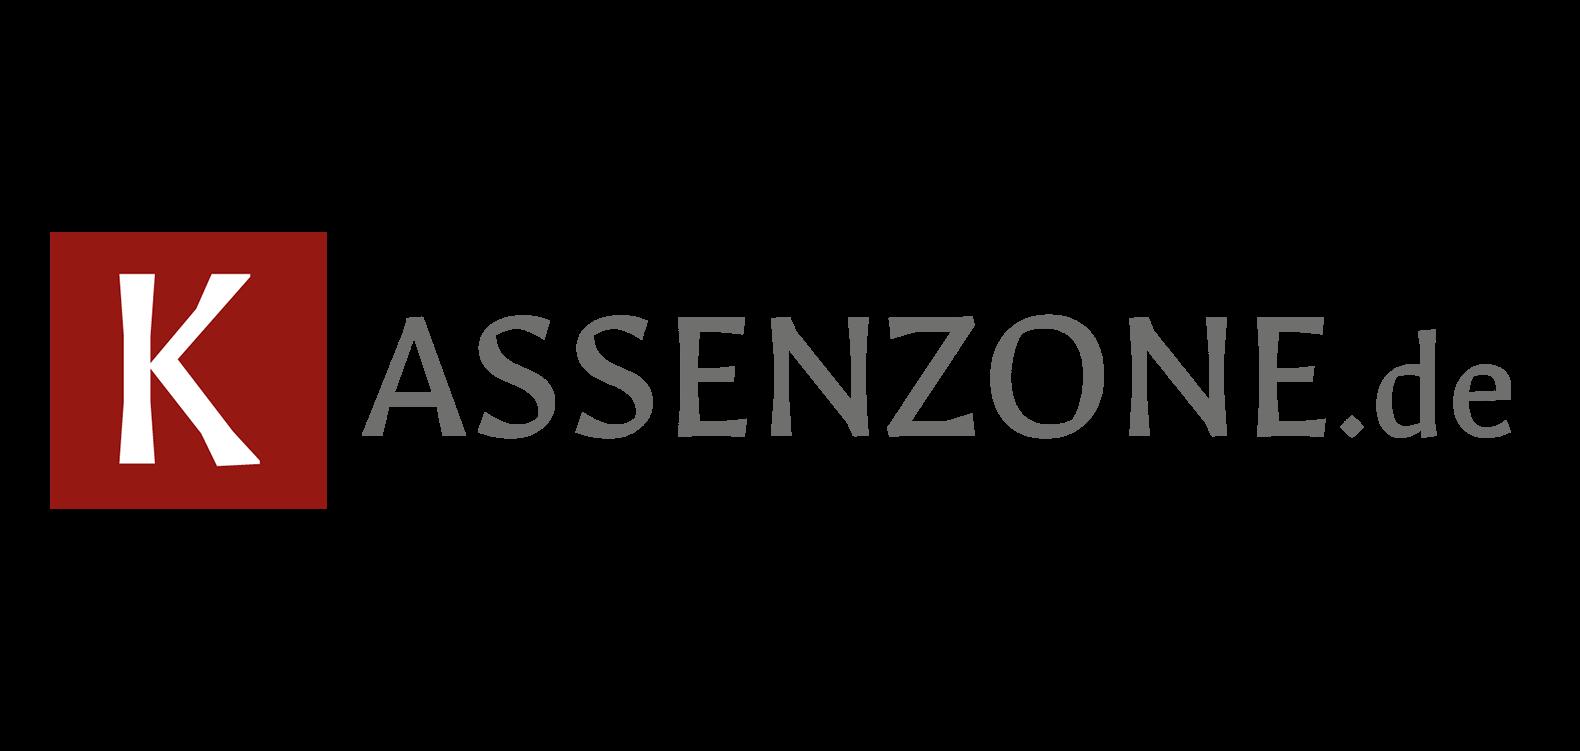 Kassenzone